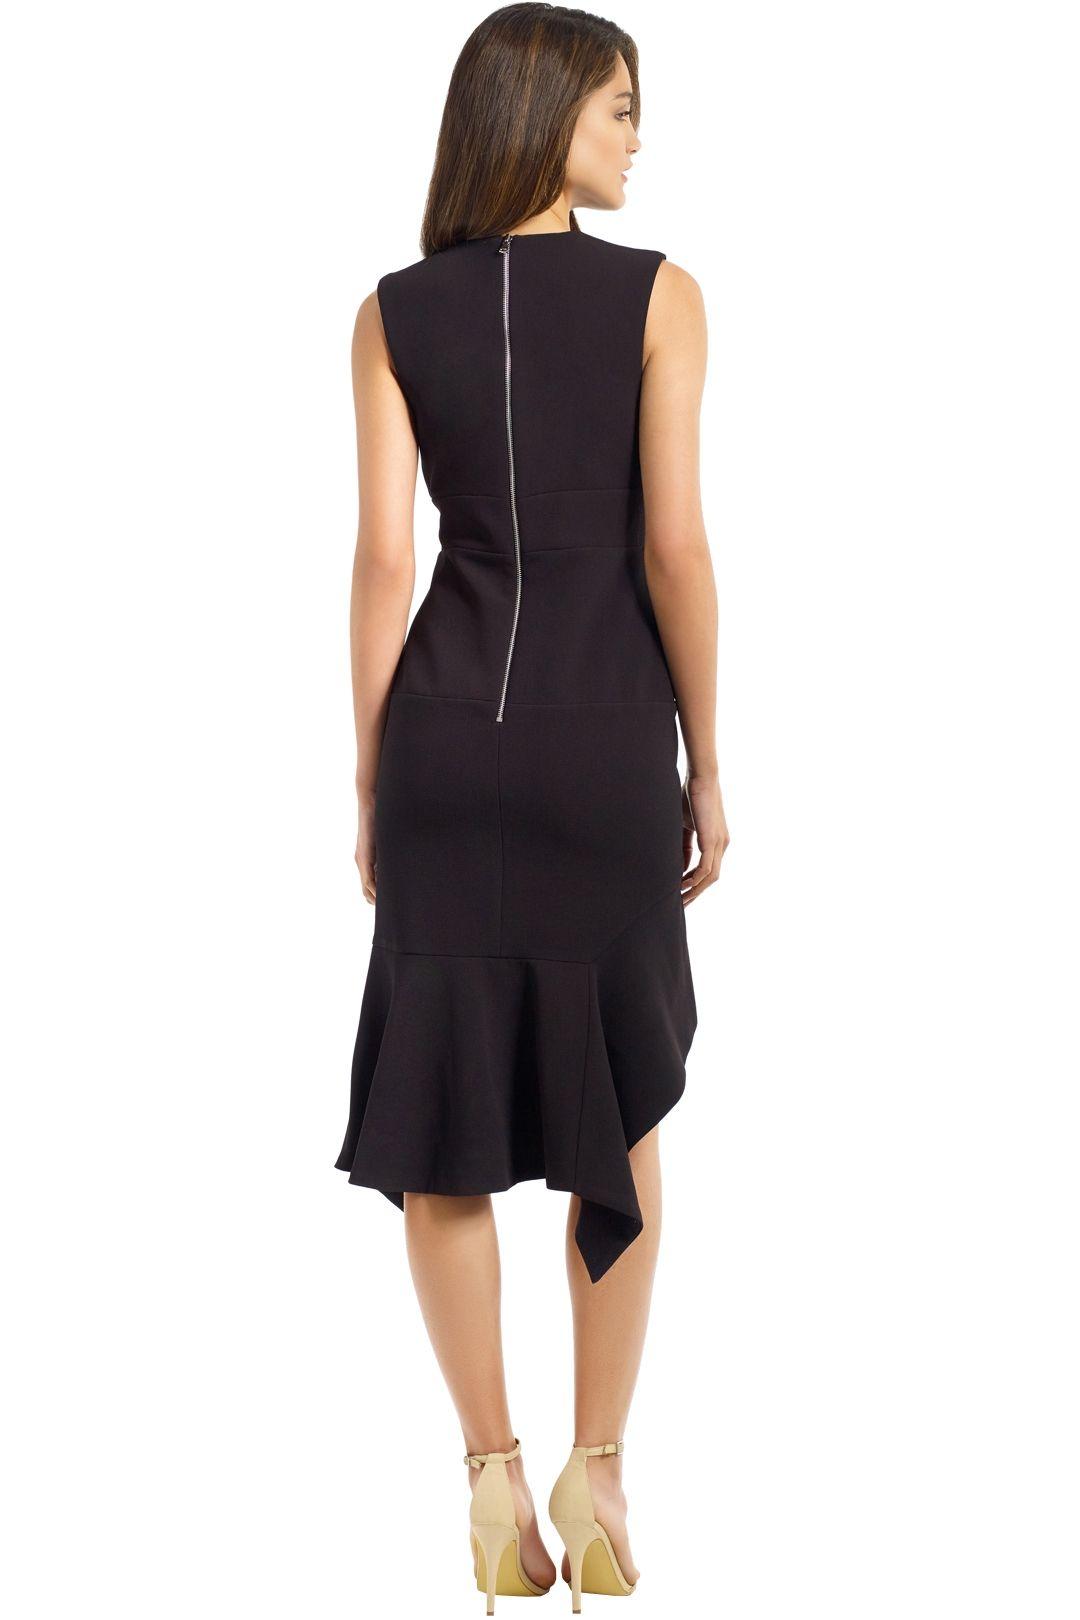 By Johnny - Midnight Panel Shift Dress - Black - Back